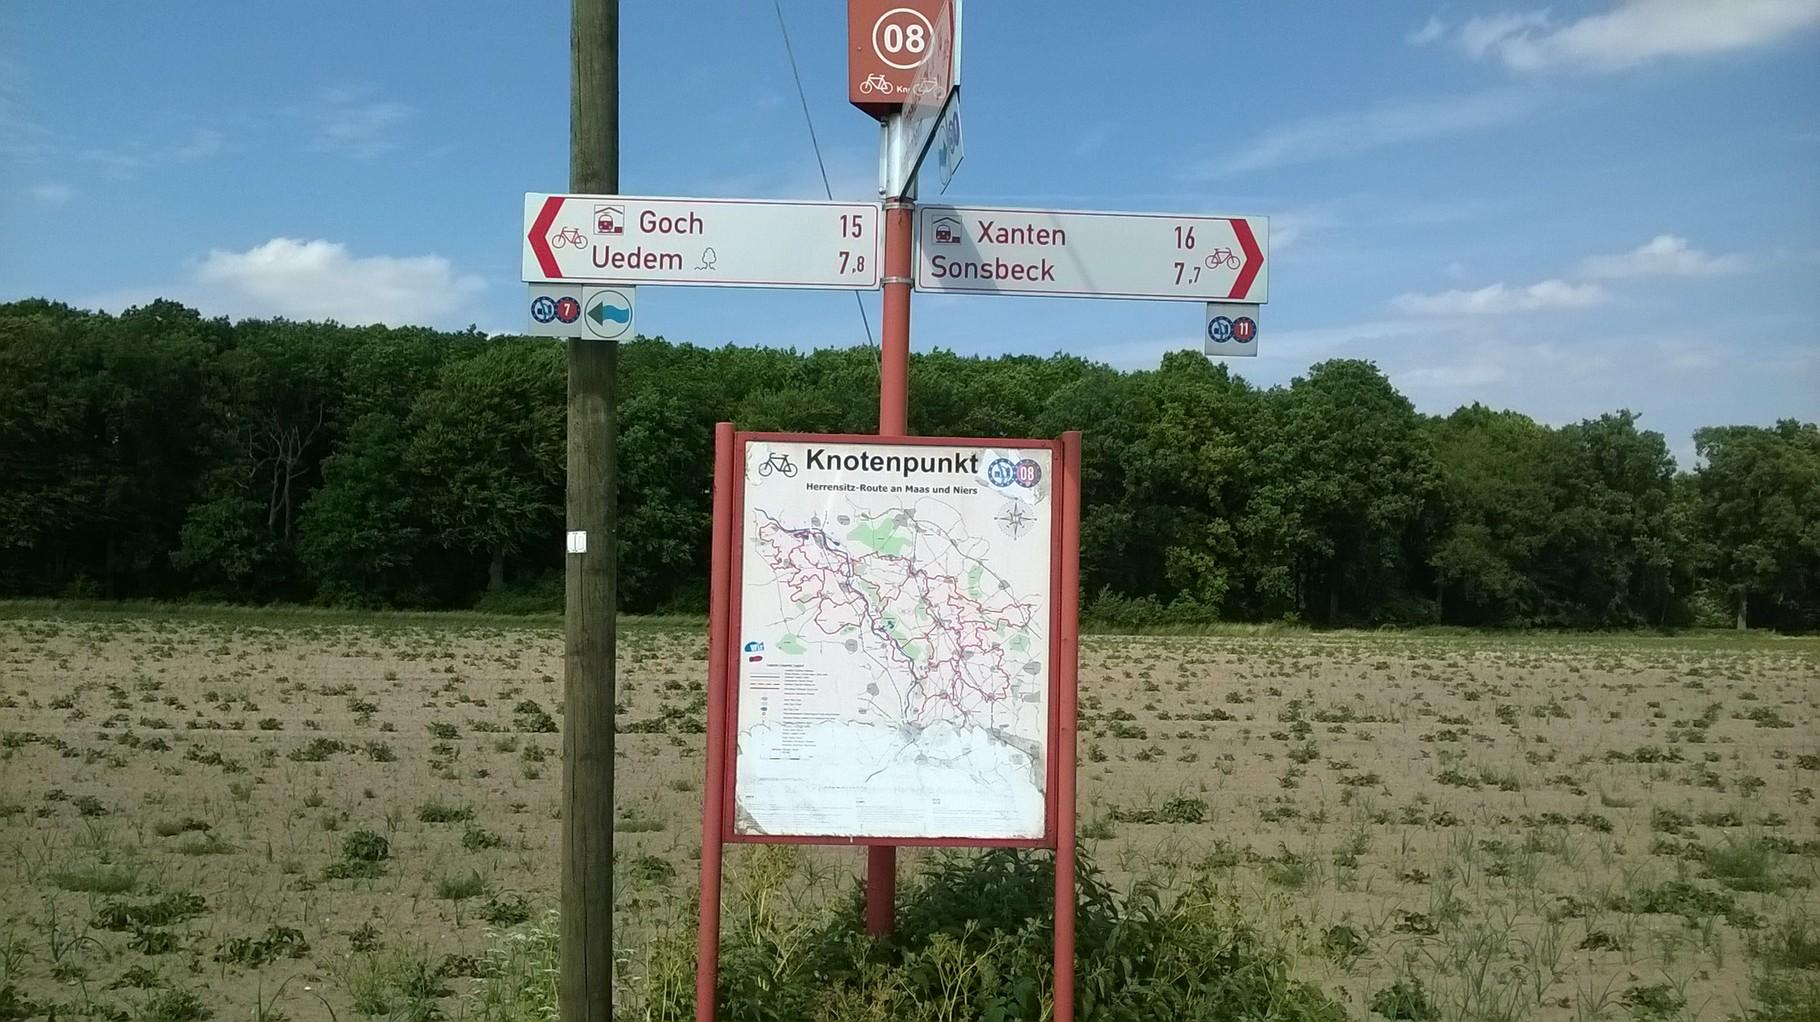 Richtung Uedem -  nicht Xanten